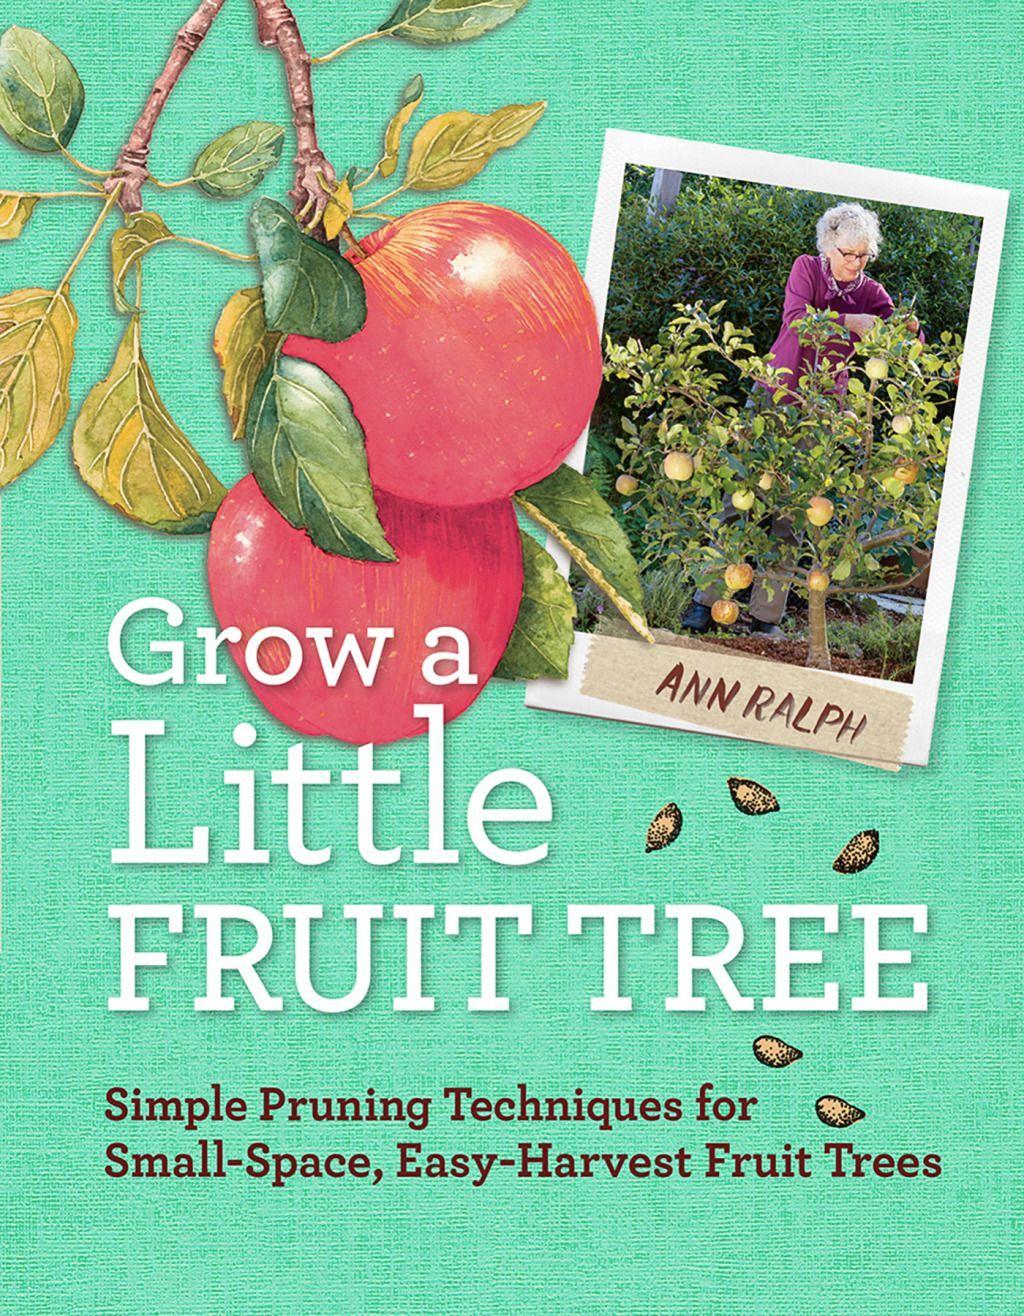 Little Fruit Ebook Grow Tree Agrow A Little Fruit Tree Ebook Grow A Little Fruit Tree Ebook Grow A Little Fruit Trees Uk Dwarf Fruit Trees Fruit Trees